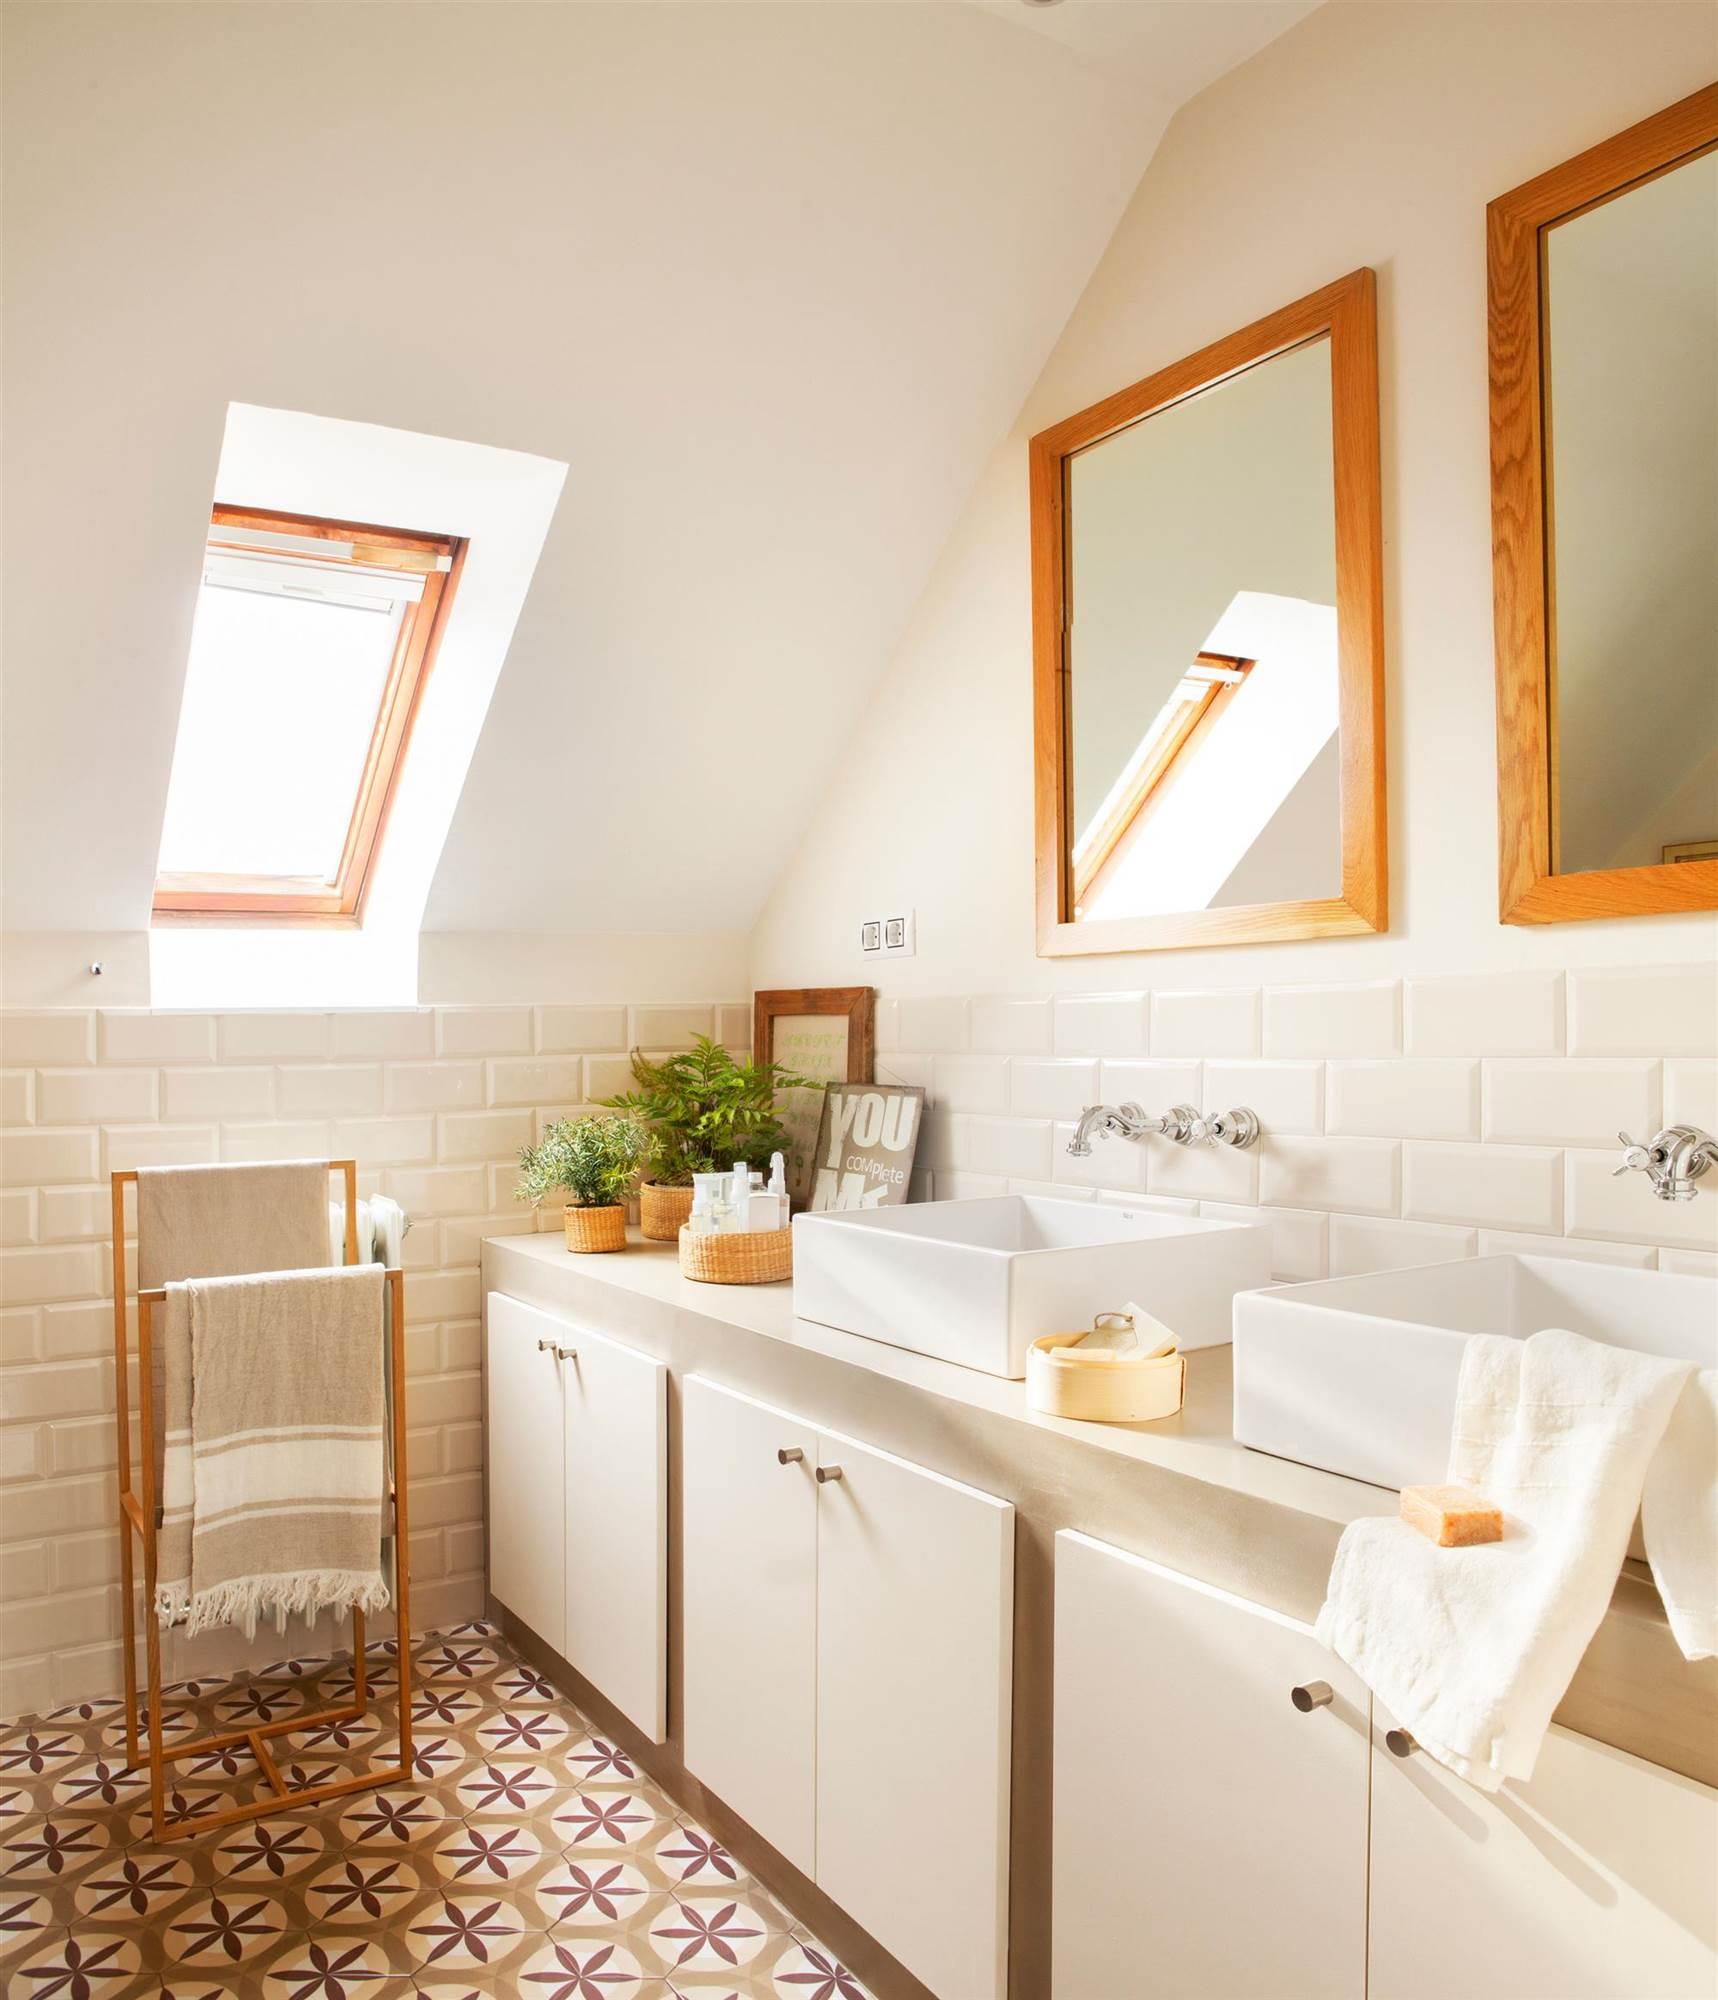 13 espacios decorados con baldosas tipo metro - Azulejos de pared ...